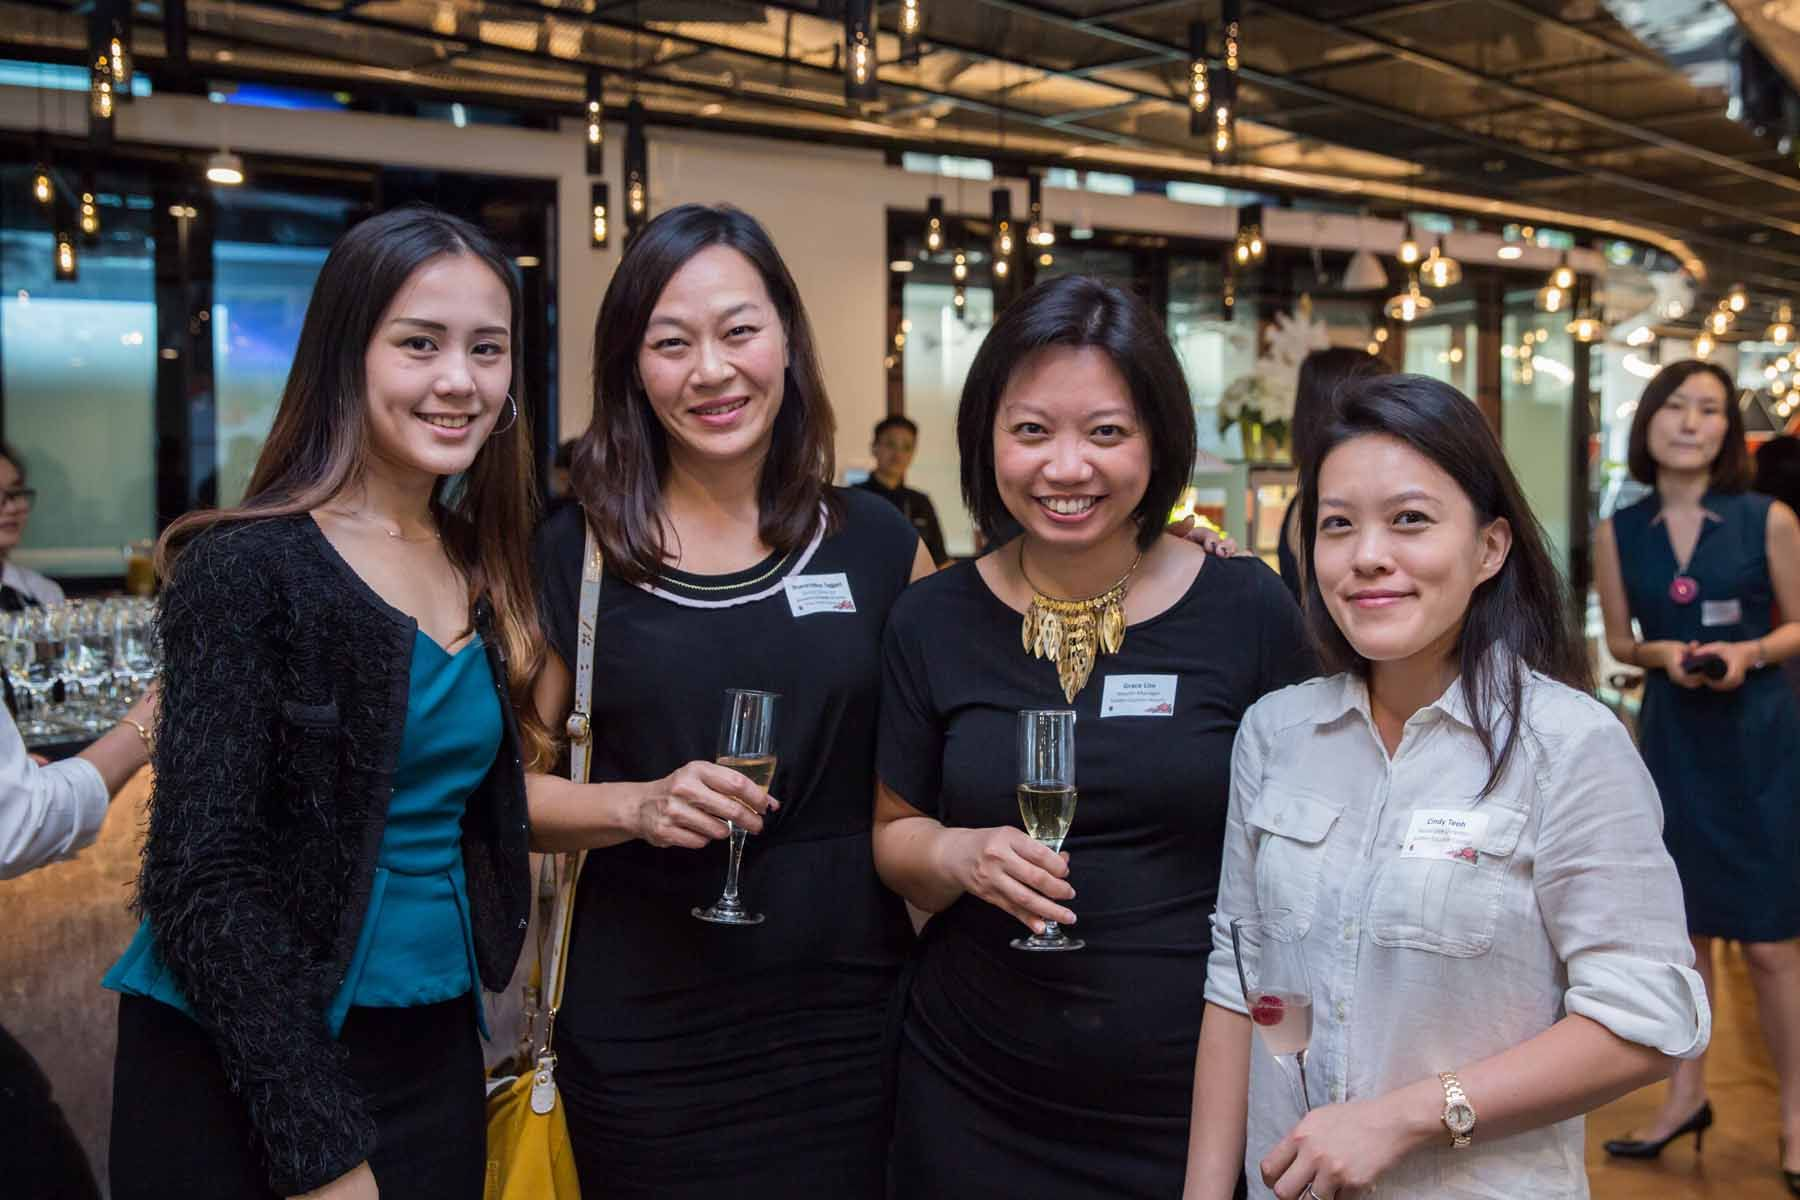 Goh Shi Hui, Sharon Moo Taggart, Grace Lim, Cindy Teoh